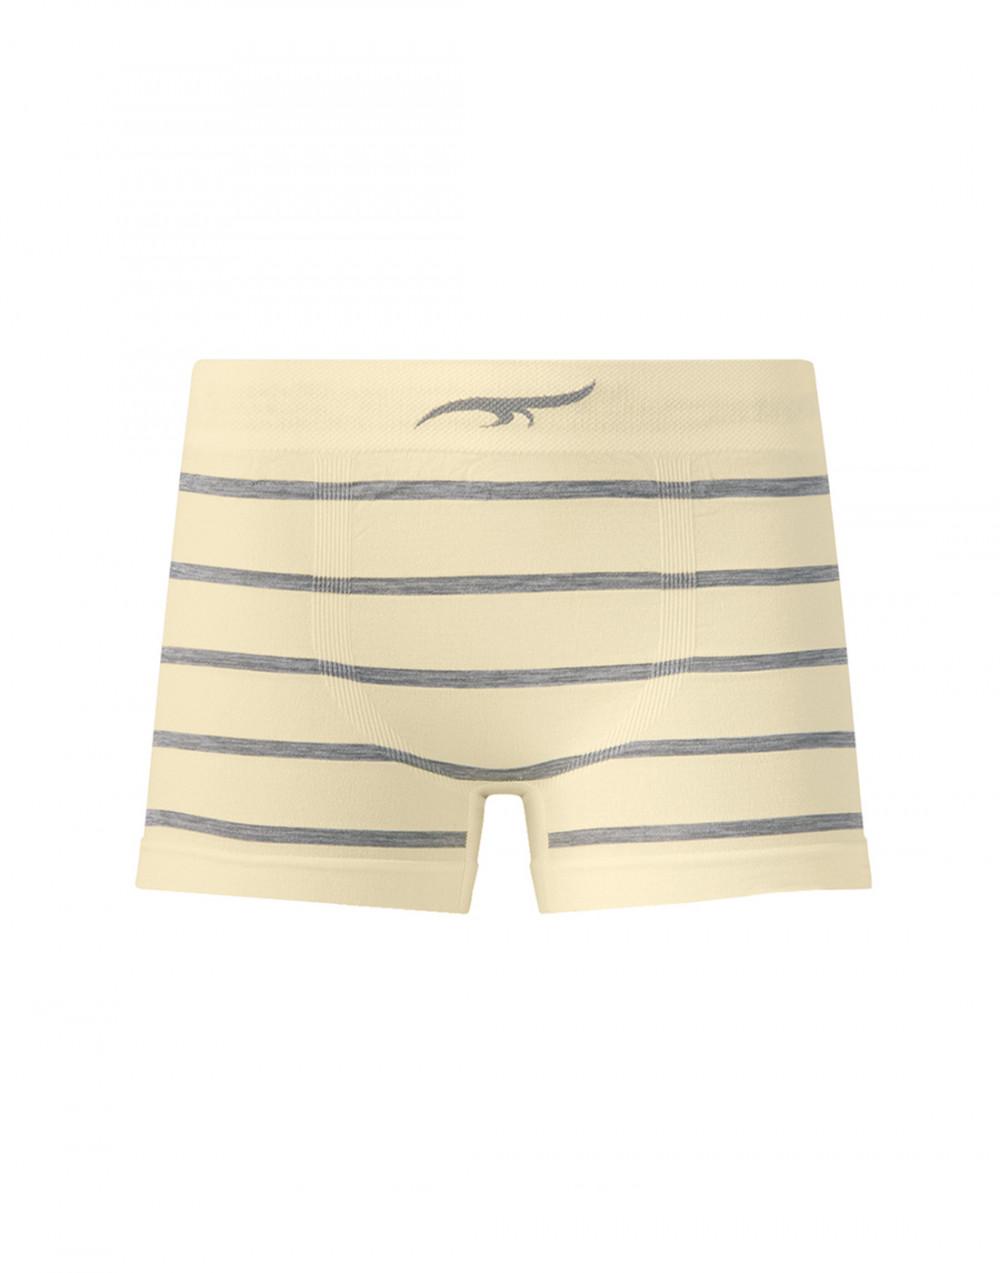 Cueca Boxer Infantil Stripes Sem Costura Zee Rucci